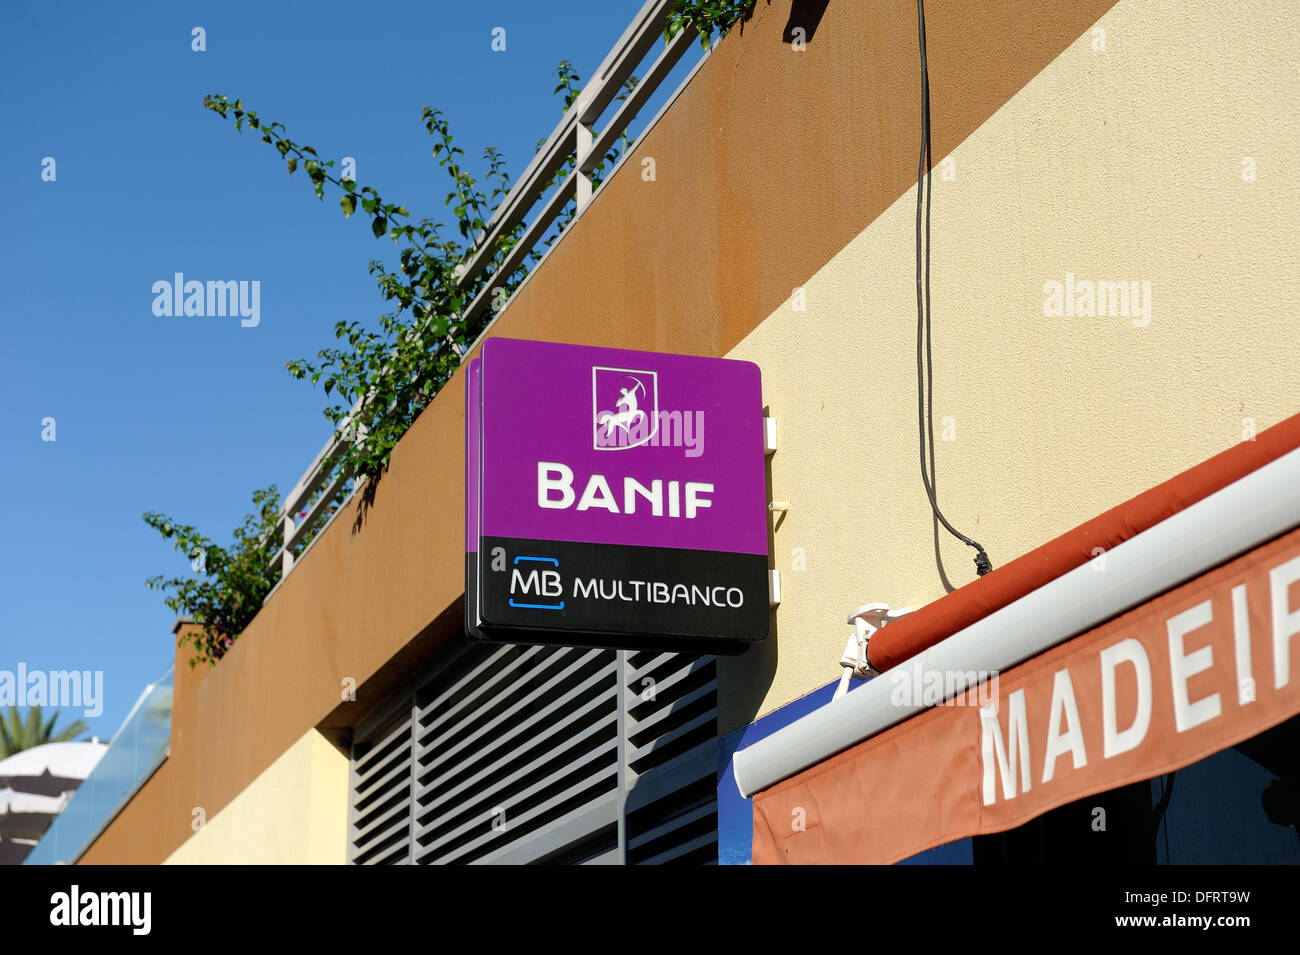 Banif Bank BANIF.LB cash machine sign Madeira Portugal - Stock Image